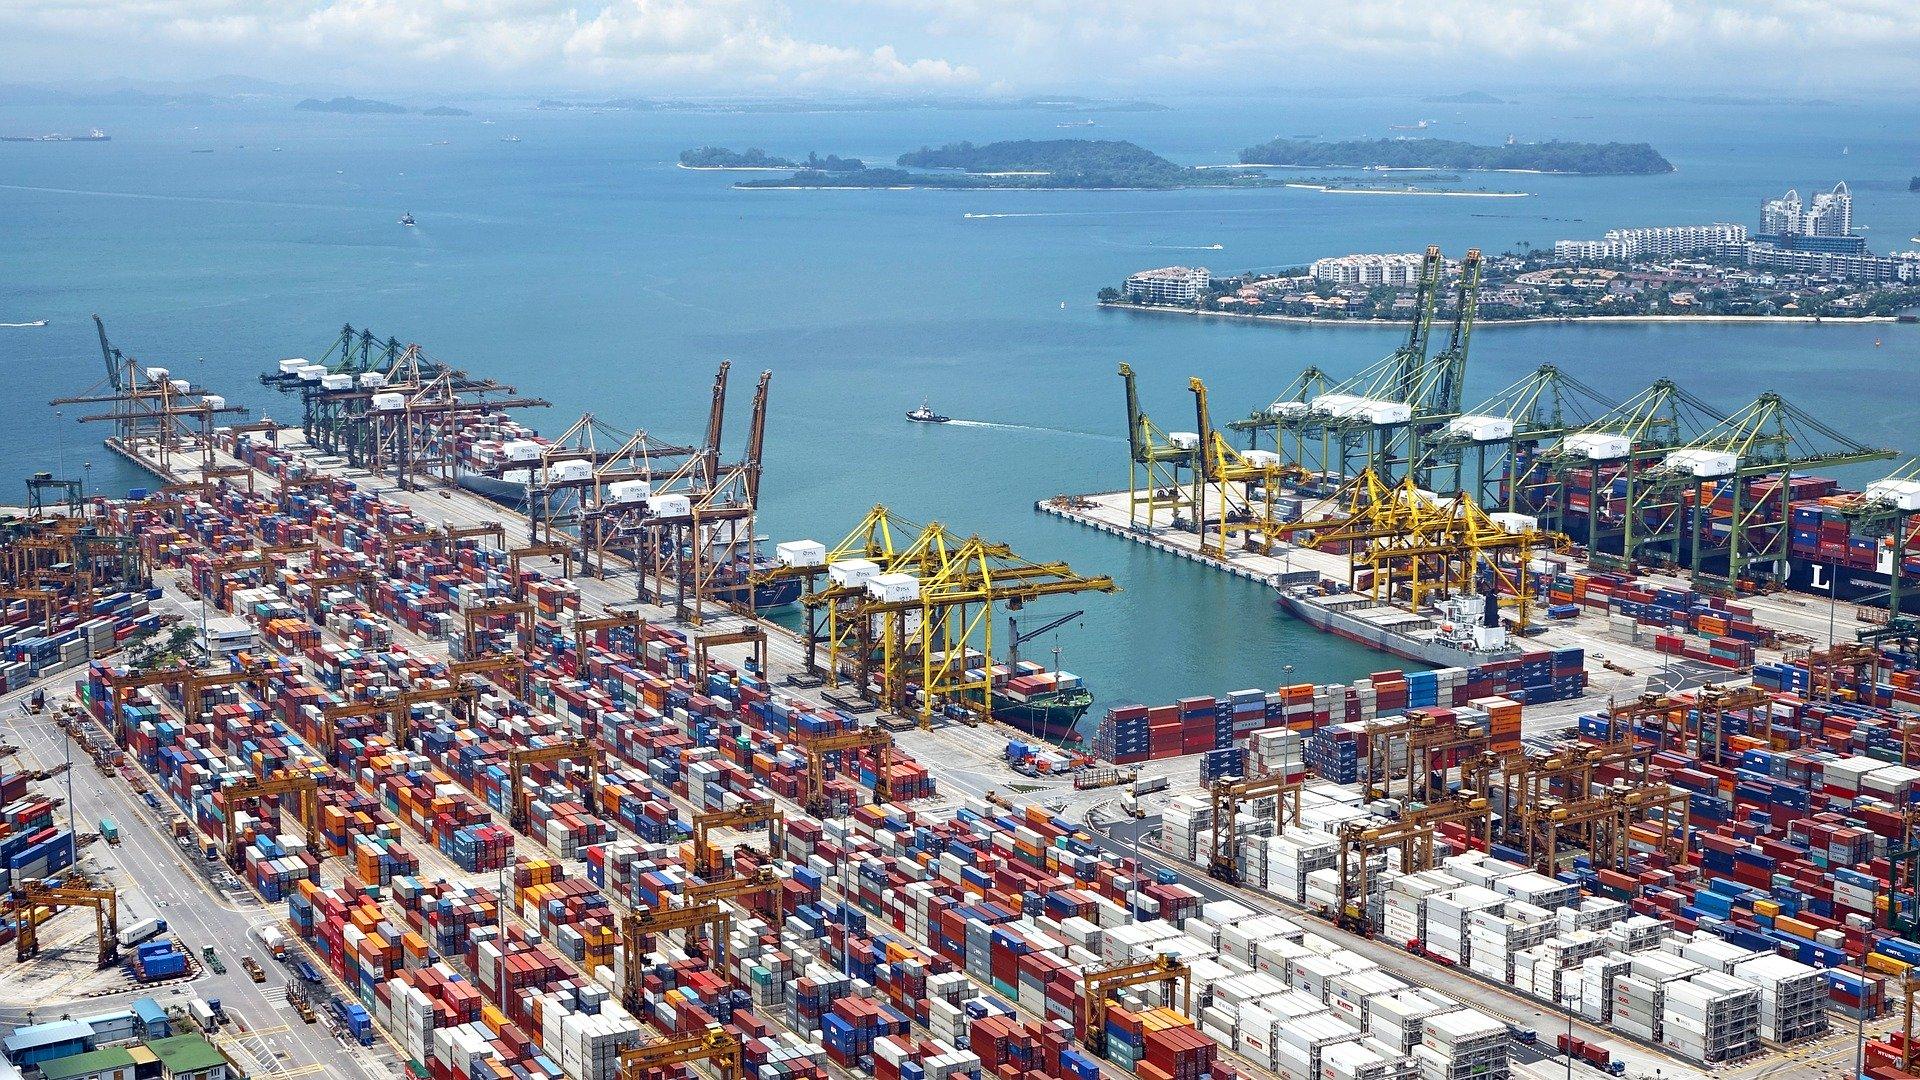 Future UK Global Tariff Policy